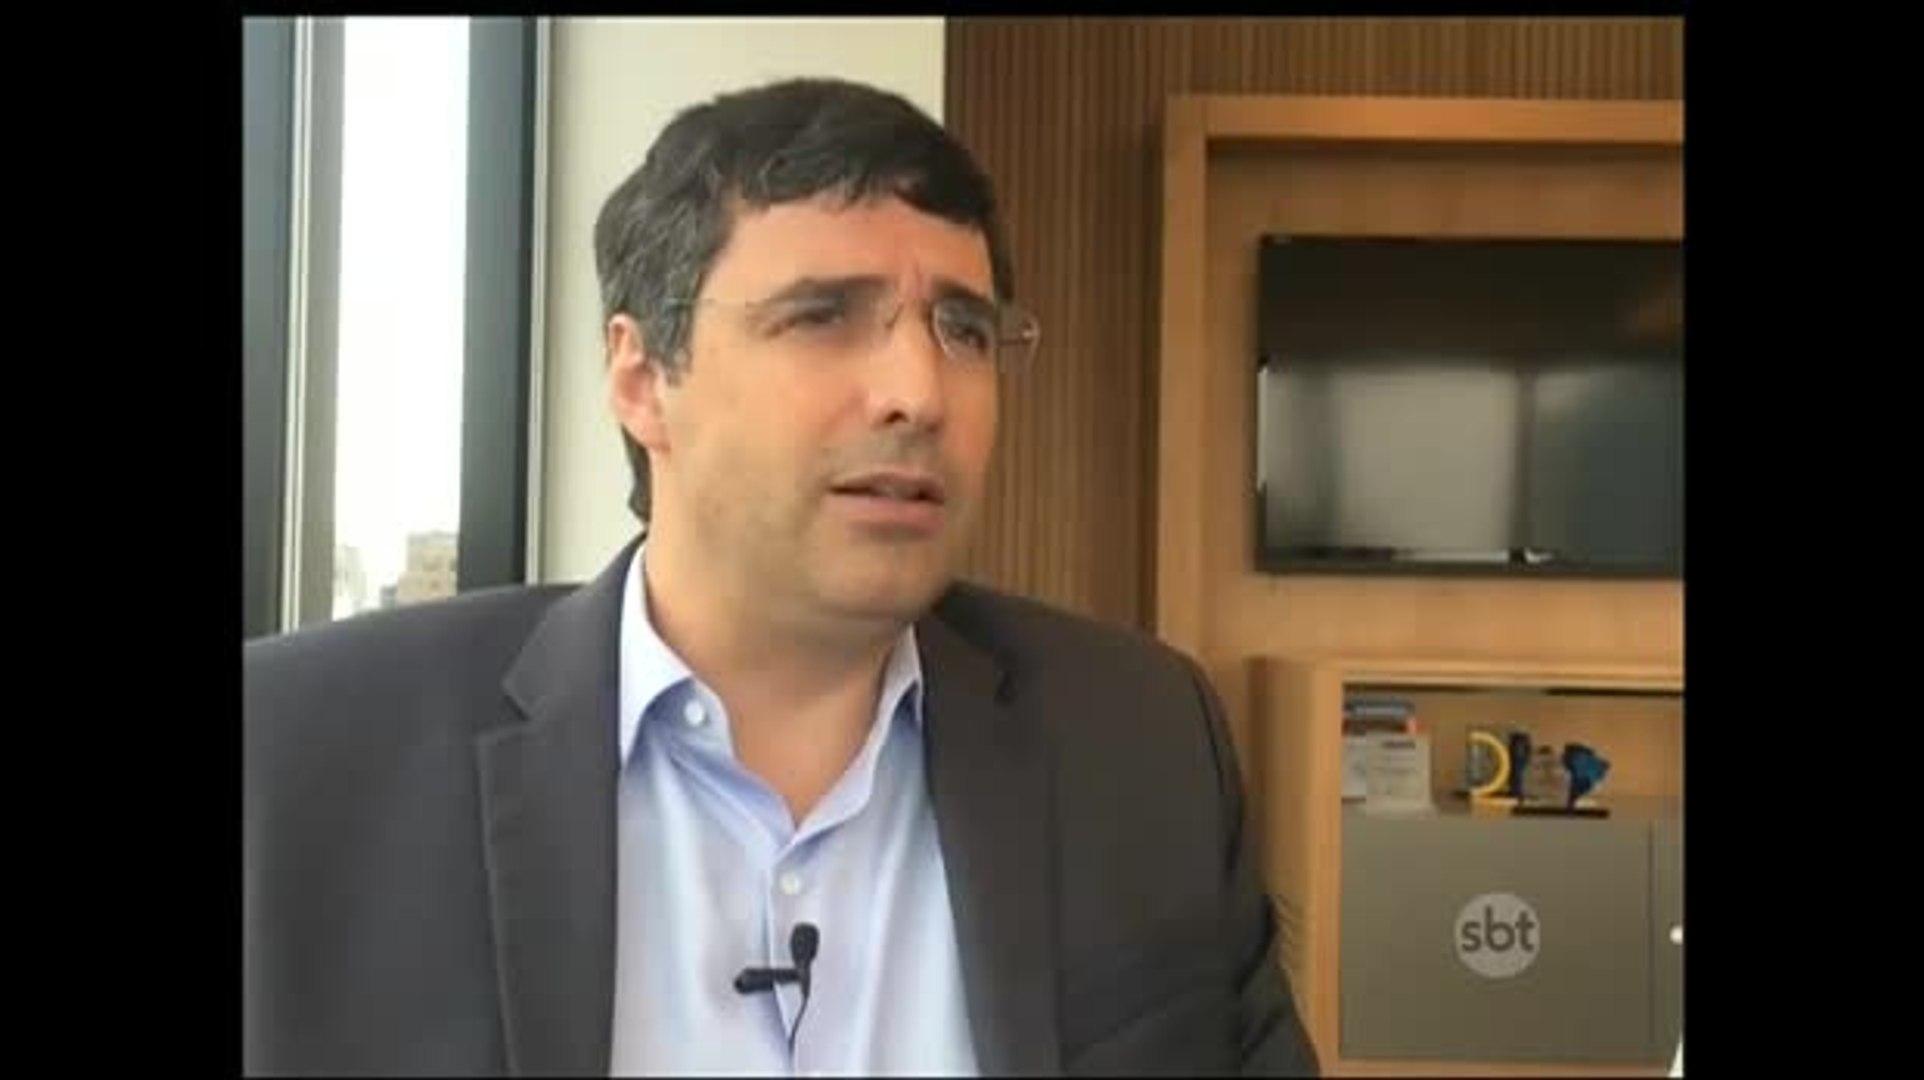 Banqueiro André Esteves é preso no Rio de Janeiro